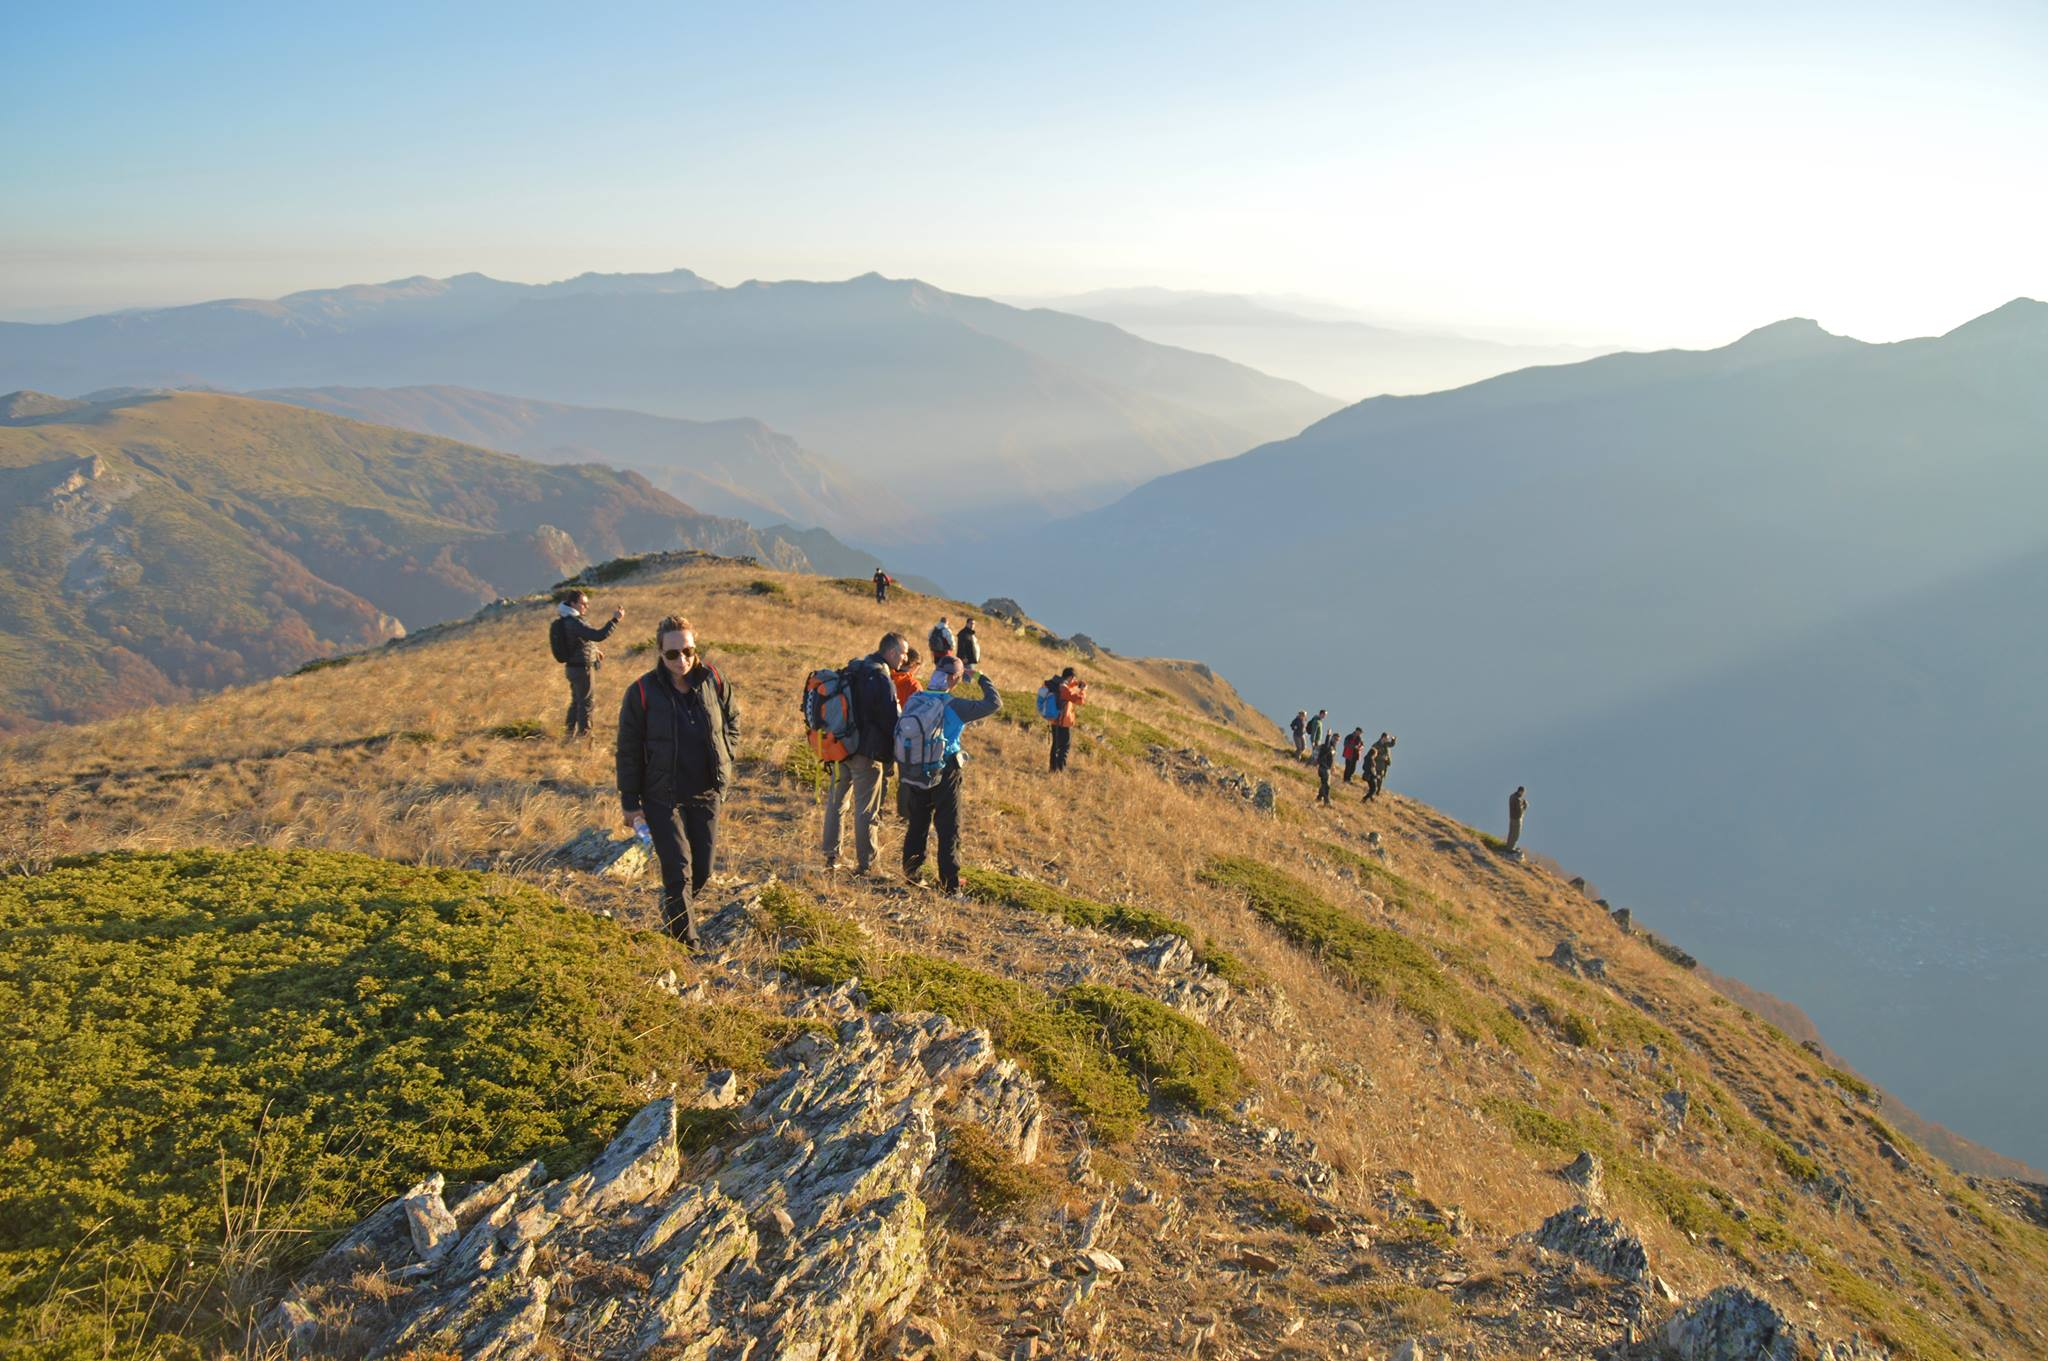 ABOVE: Distributing salt tablets on the peaks